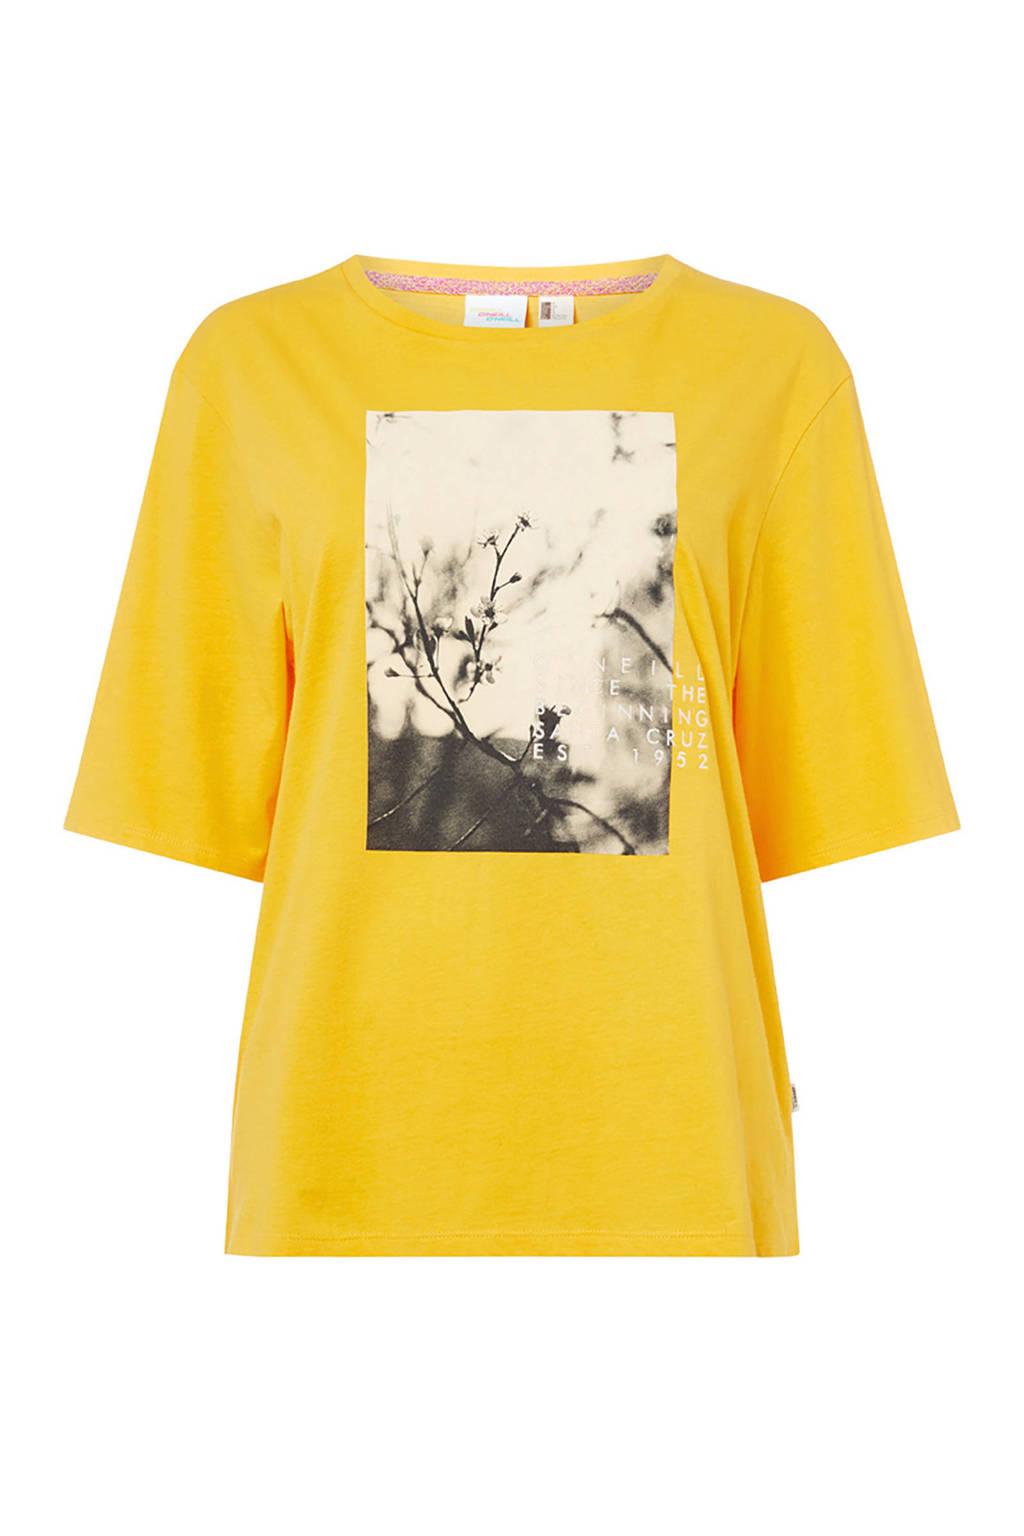 O'Neill T-shirt met printopdruk vivid yellow, Vivid Yellow